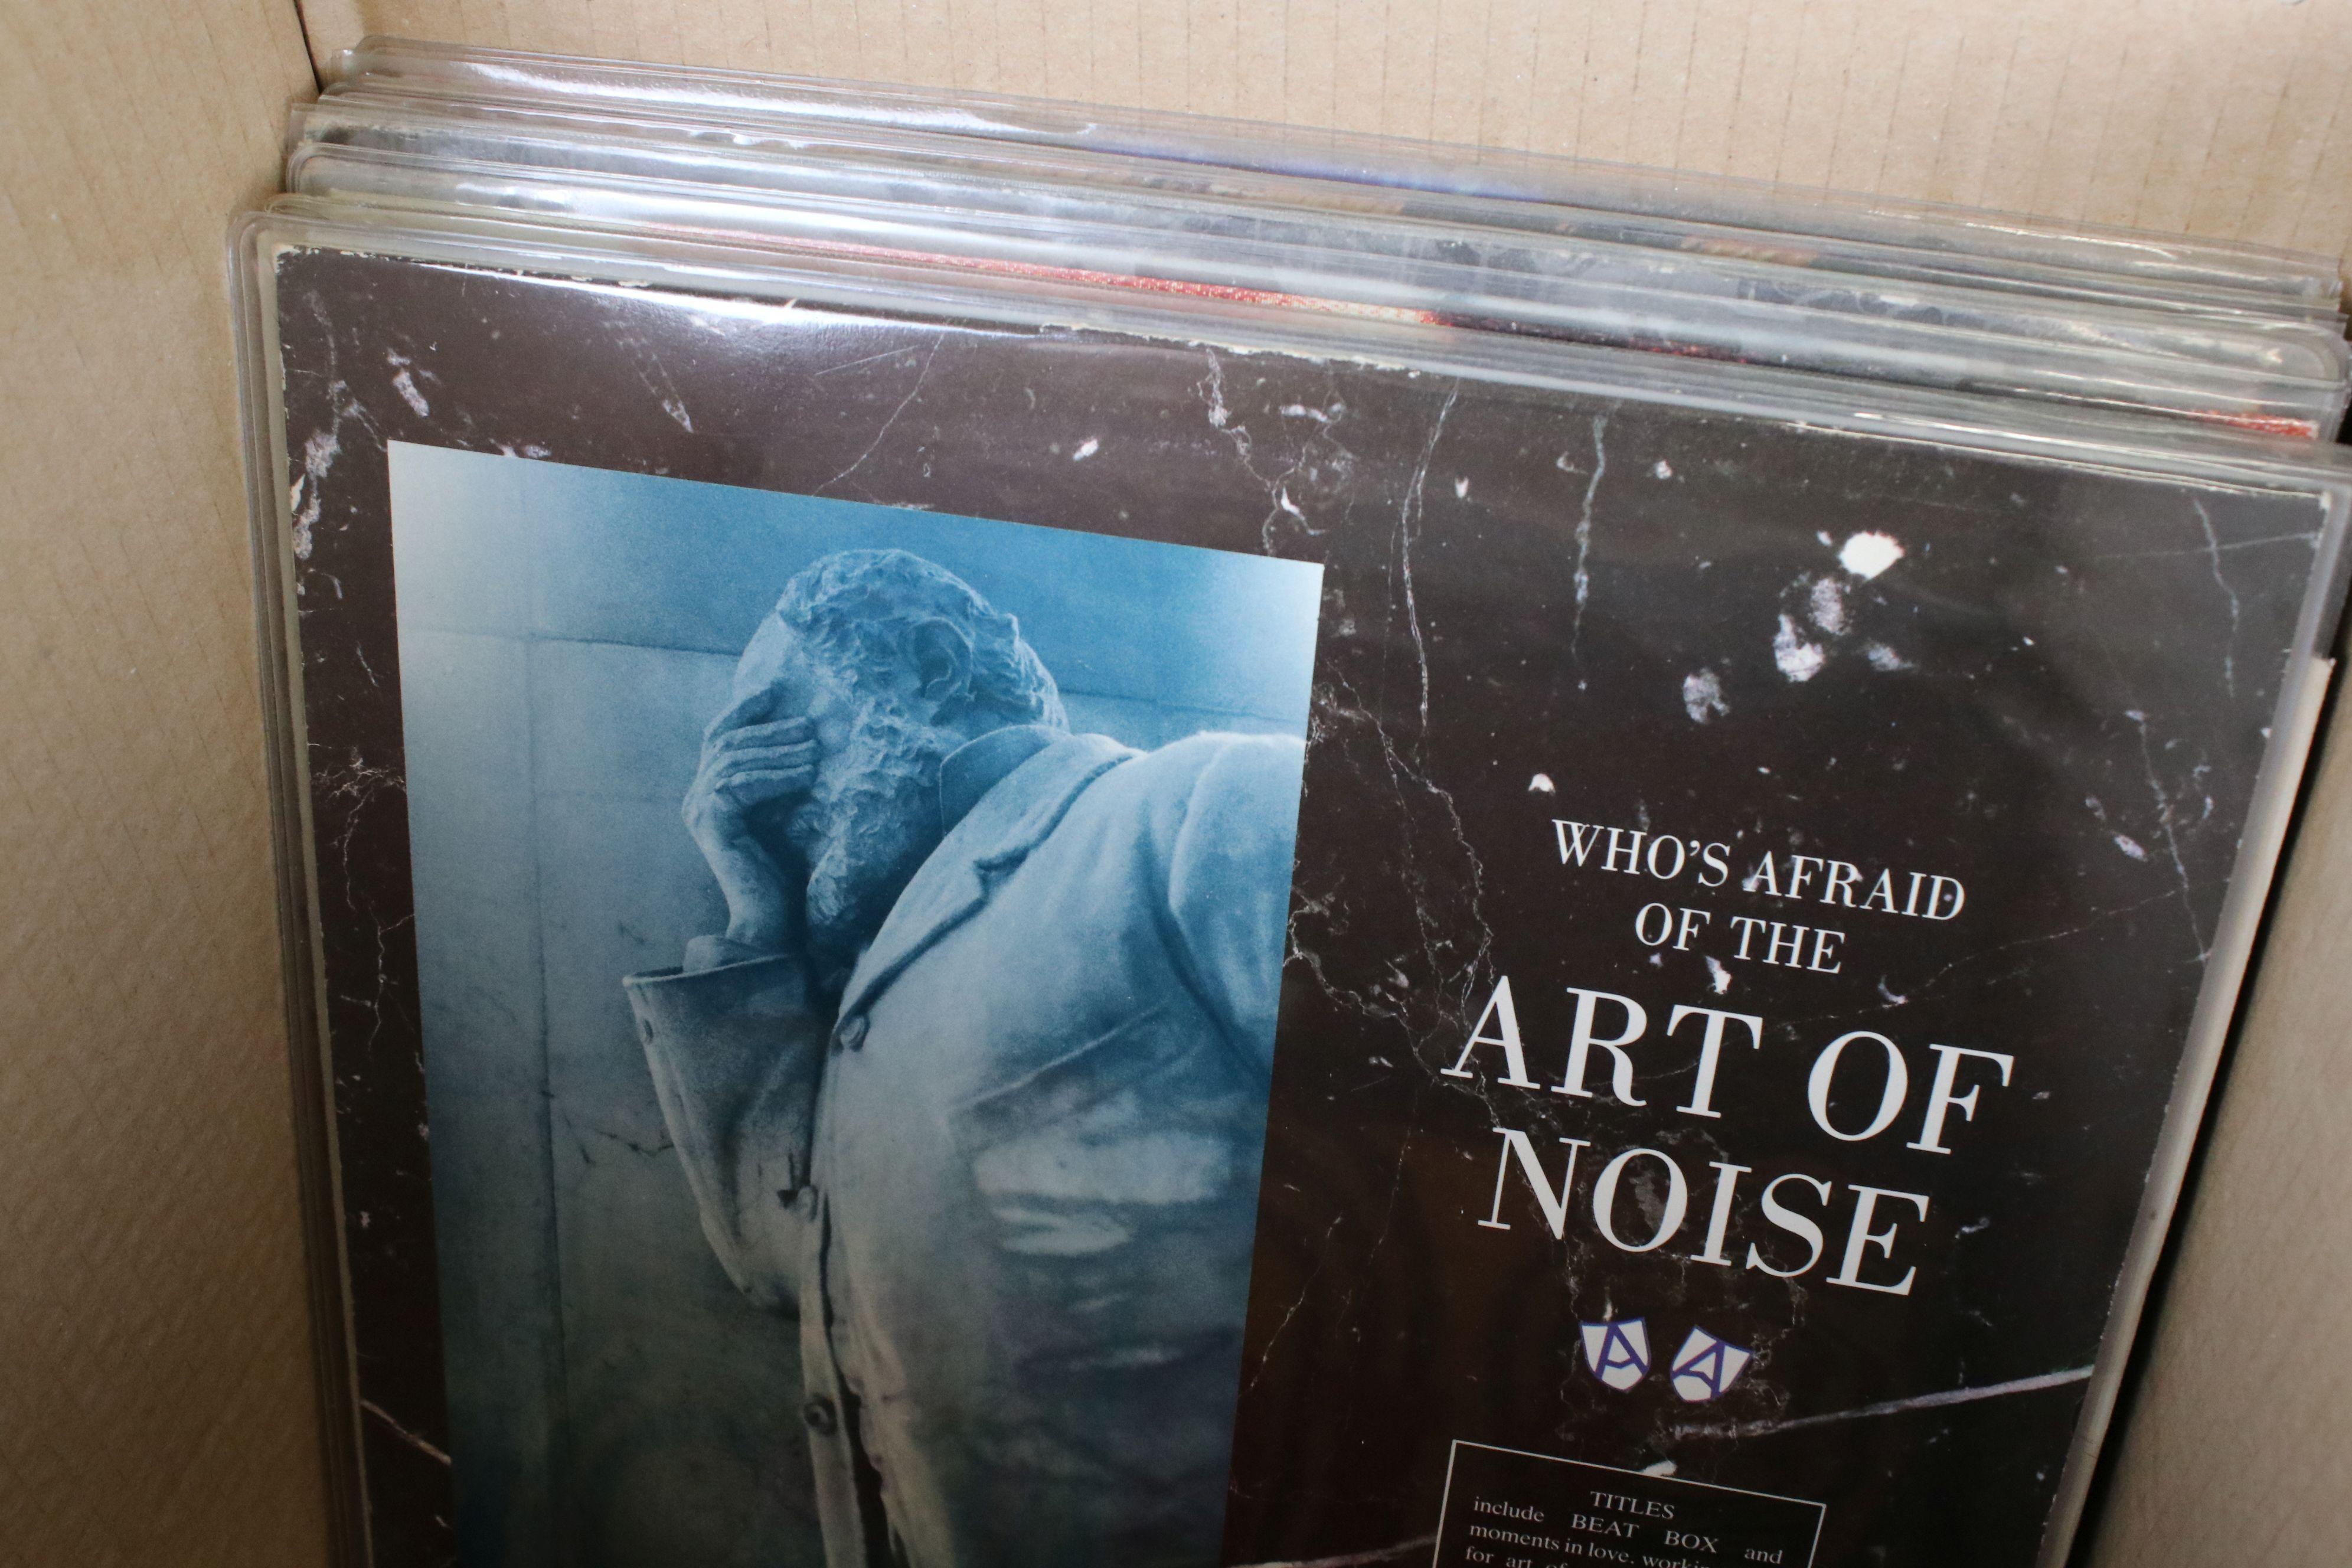 Vinyl - Around 24 Punk, New Wave, Indie LPs to include Gary Numan, Republicas, Blancmange etc, - Image 4 of 9